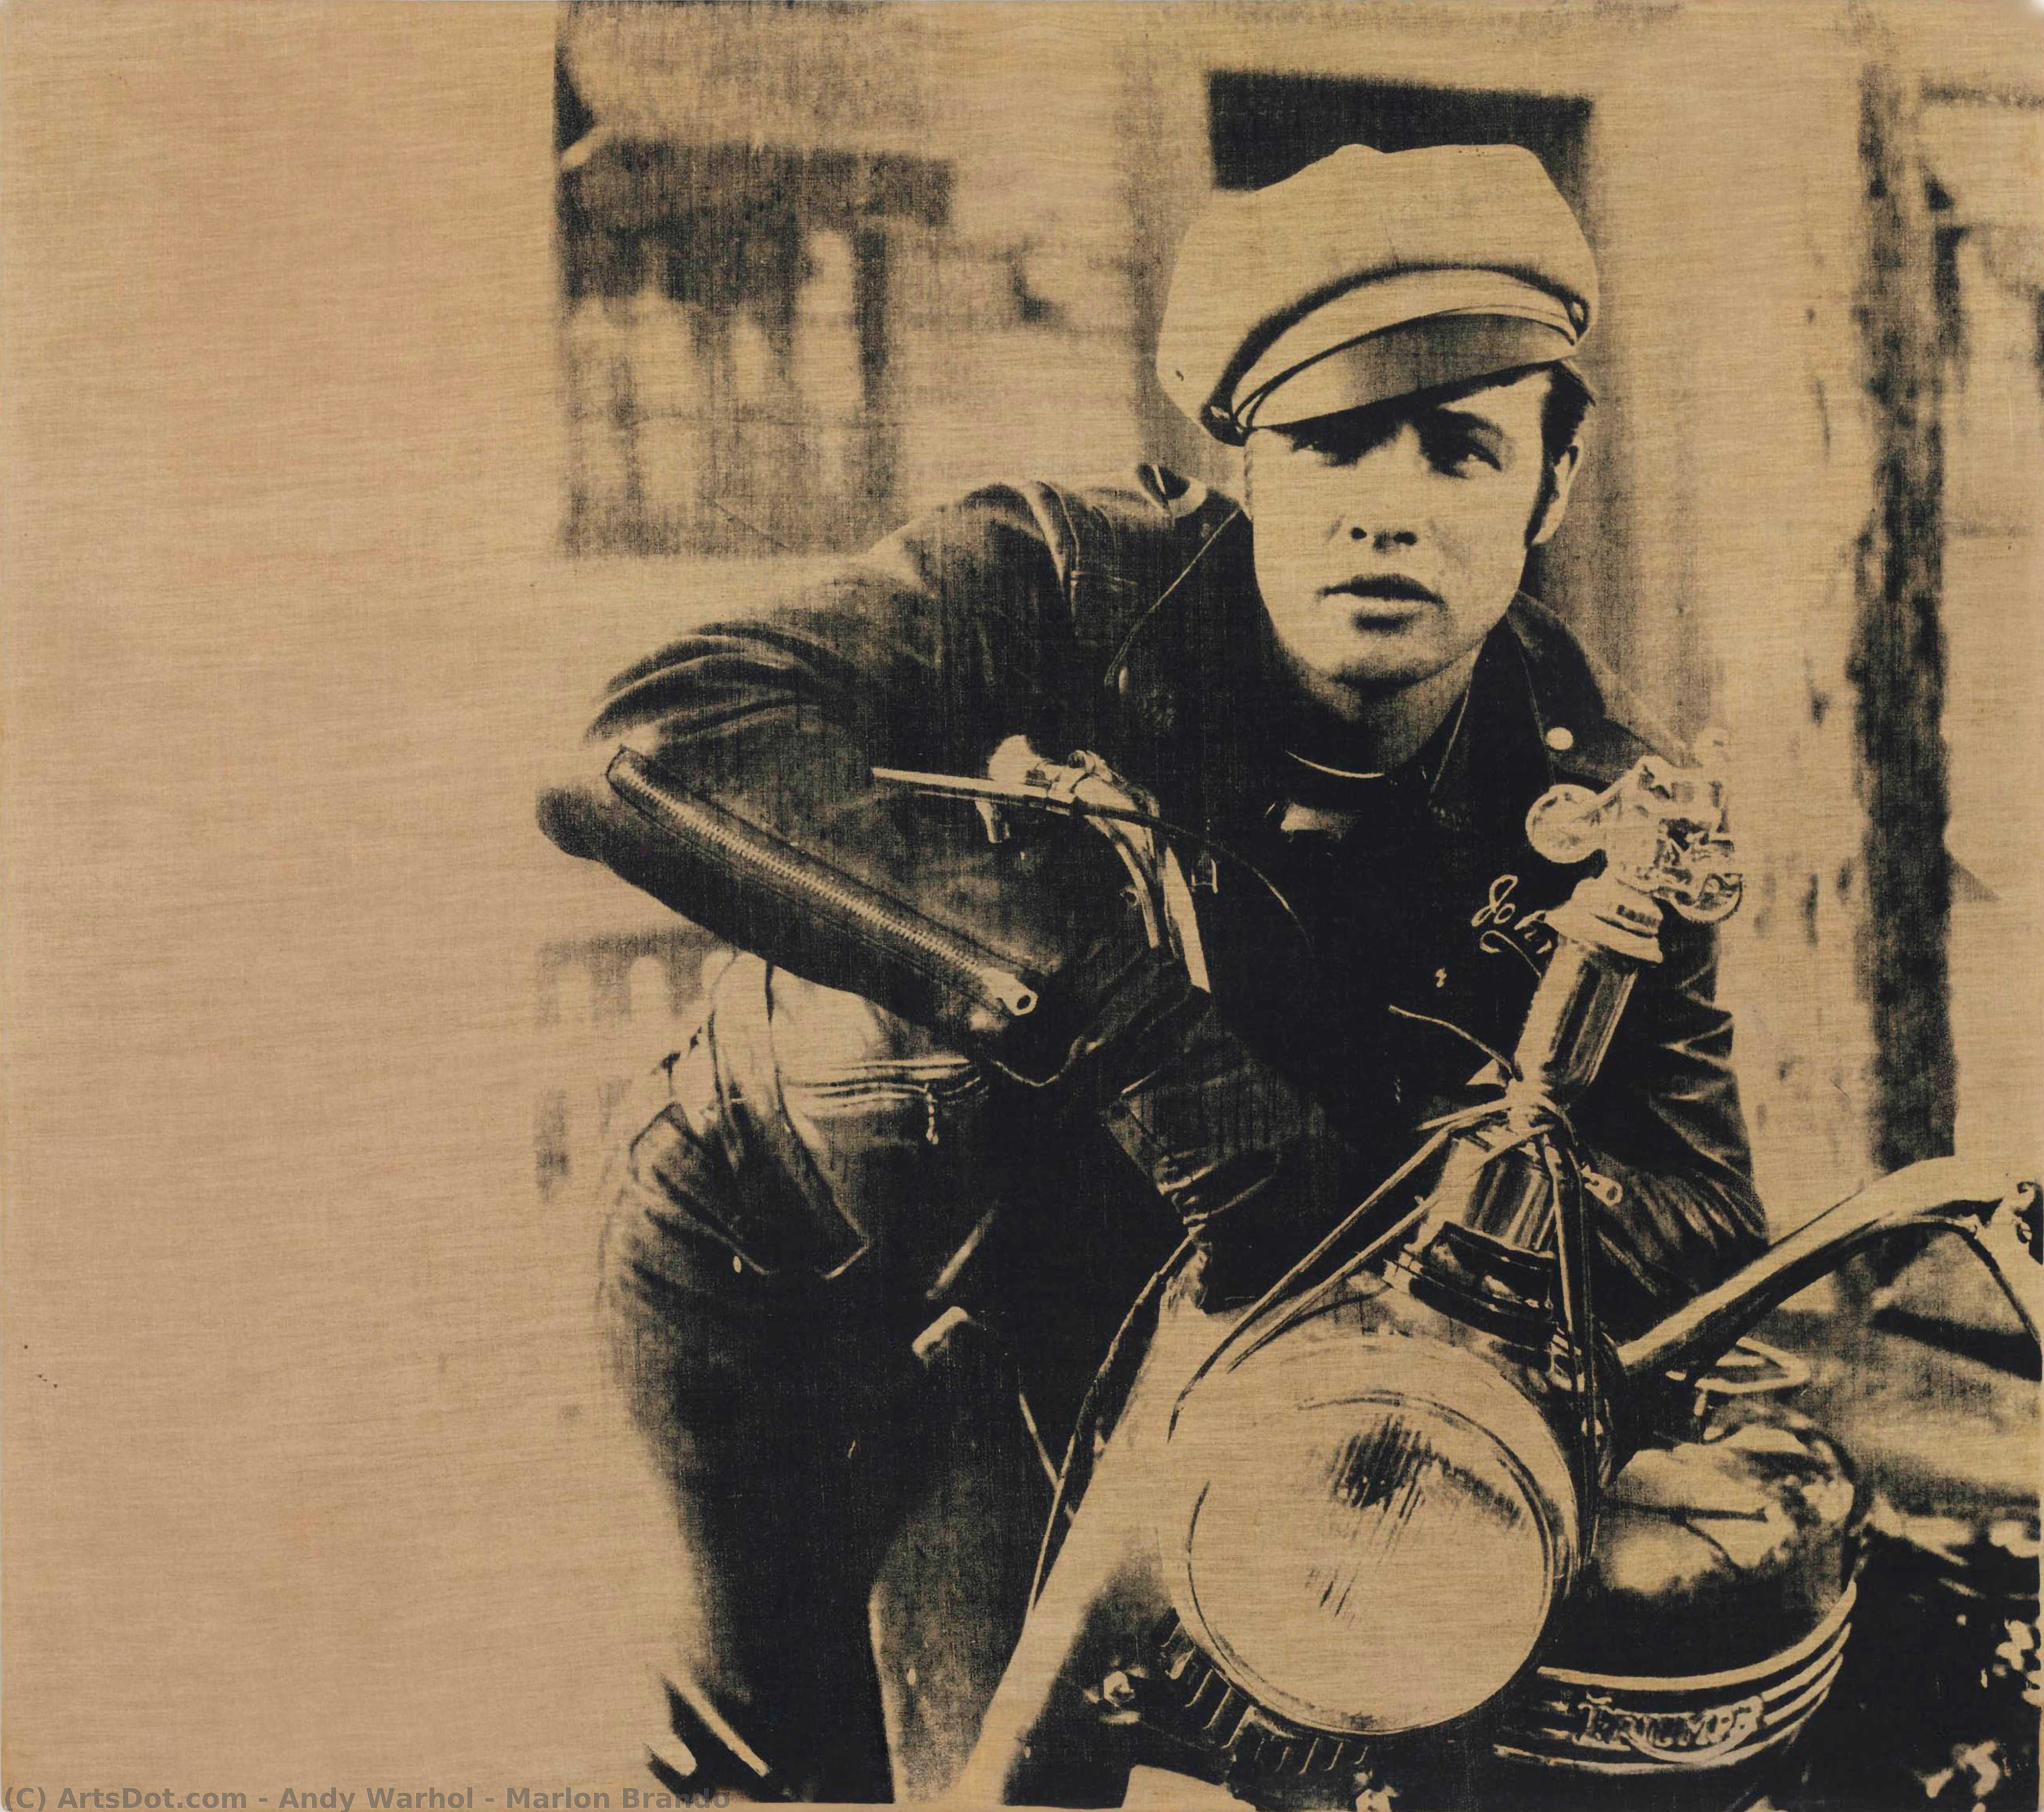 Wikioo.org - The Encyclopedia of Fine Arts - Painting, Artwork by Andy Warhol - Marlon Brando